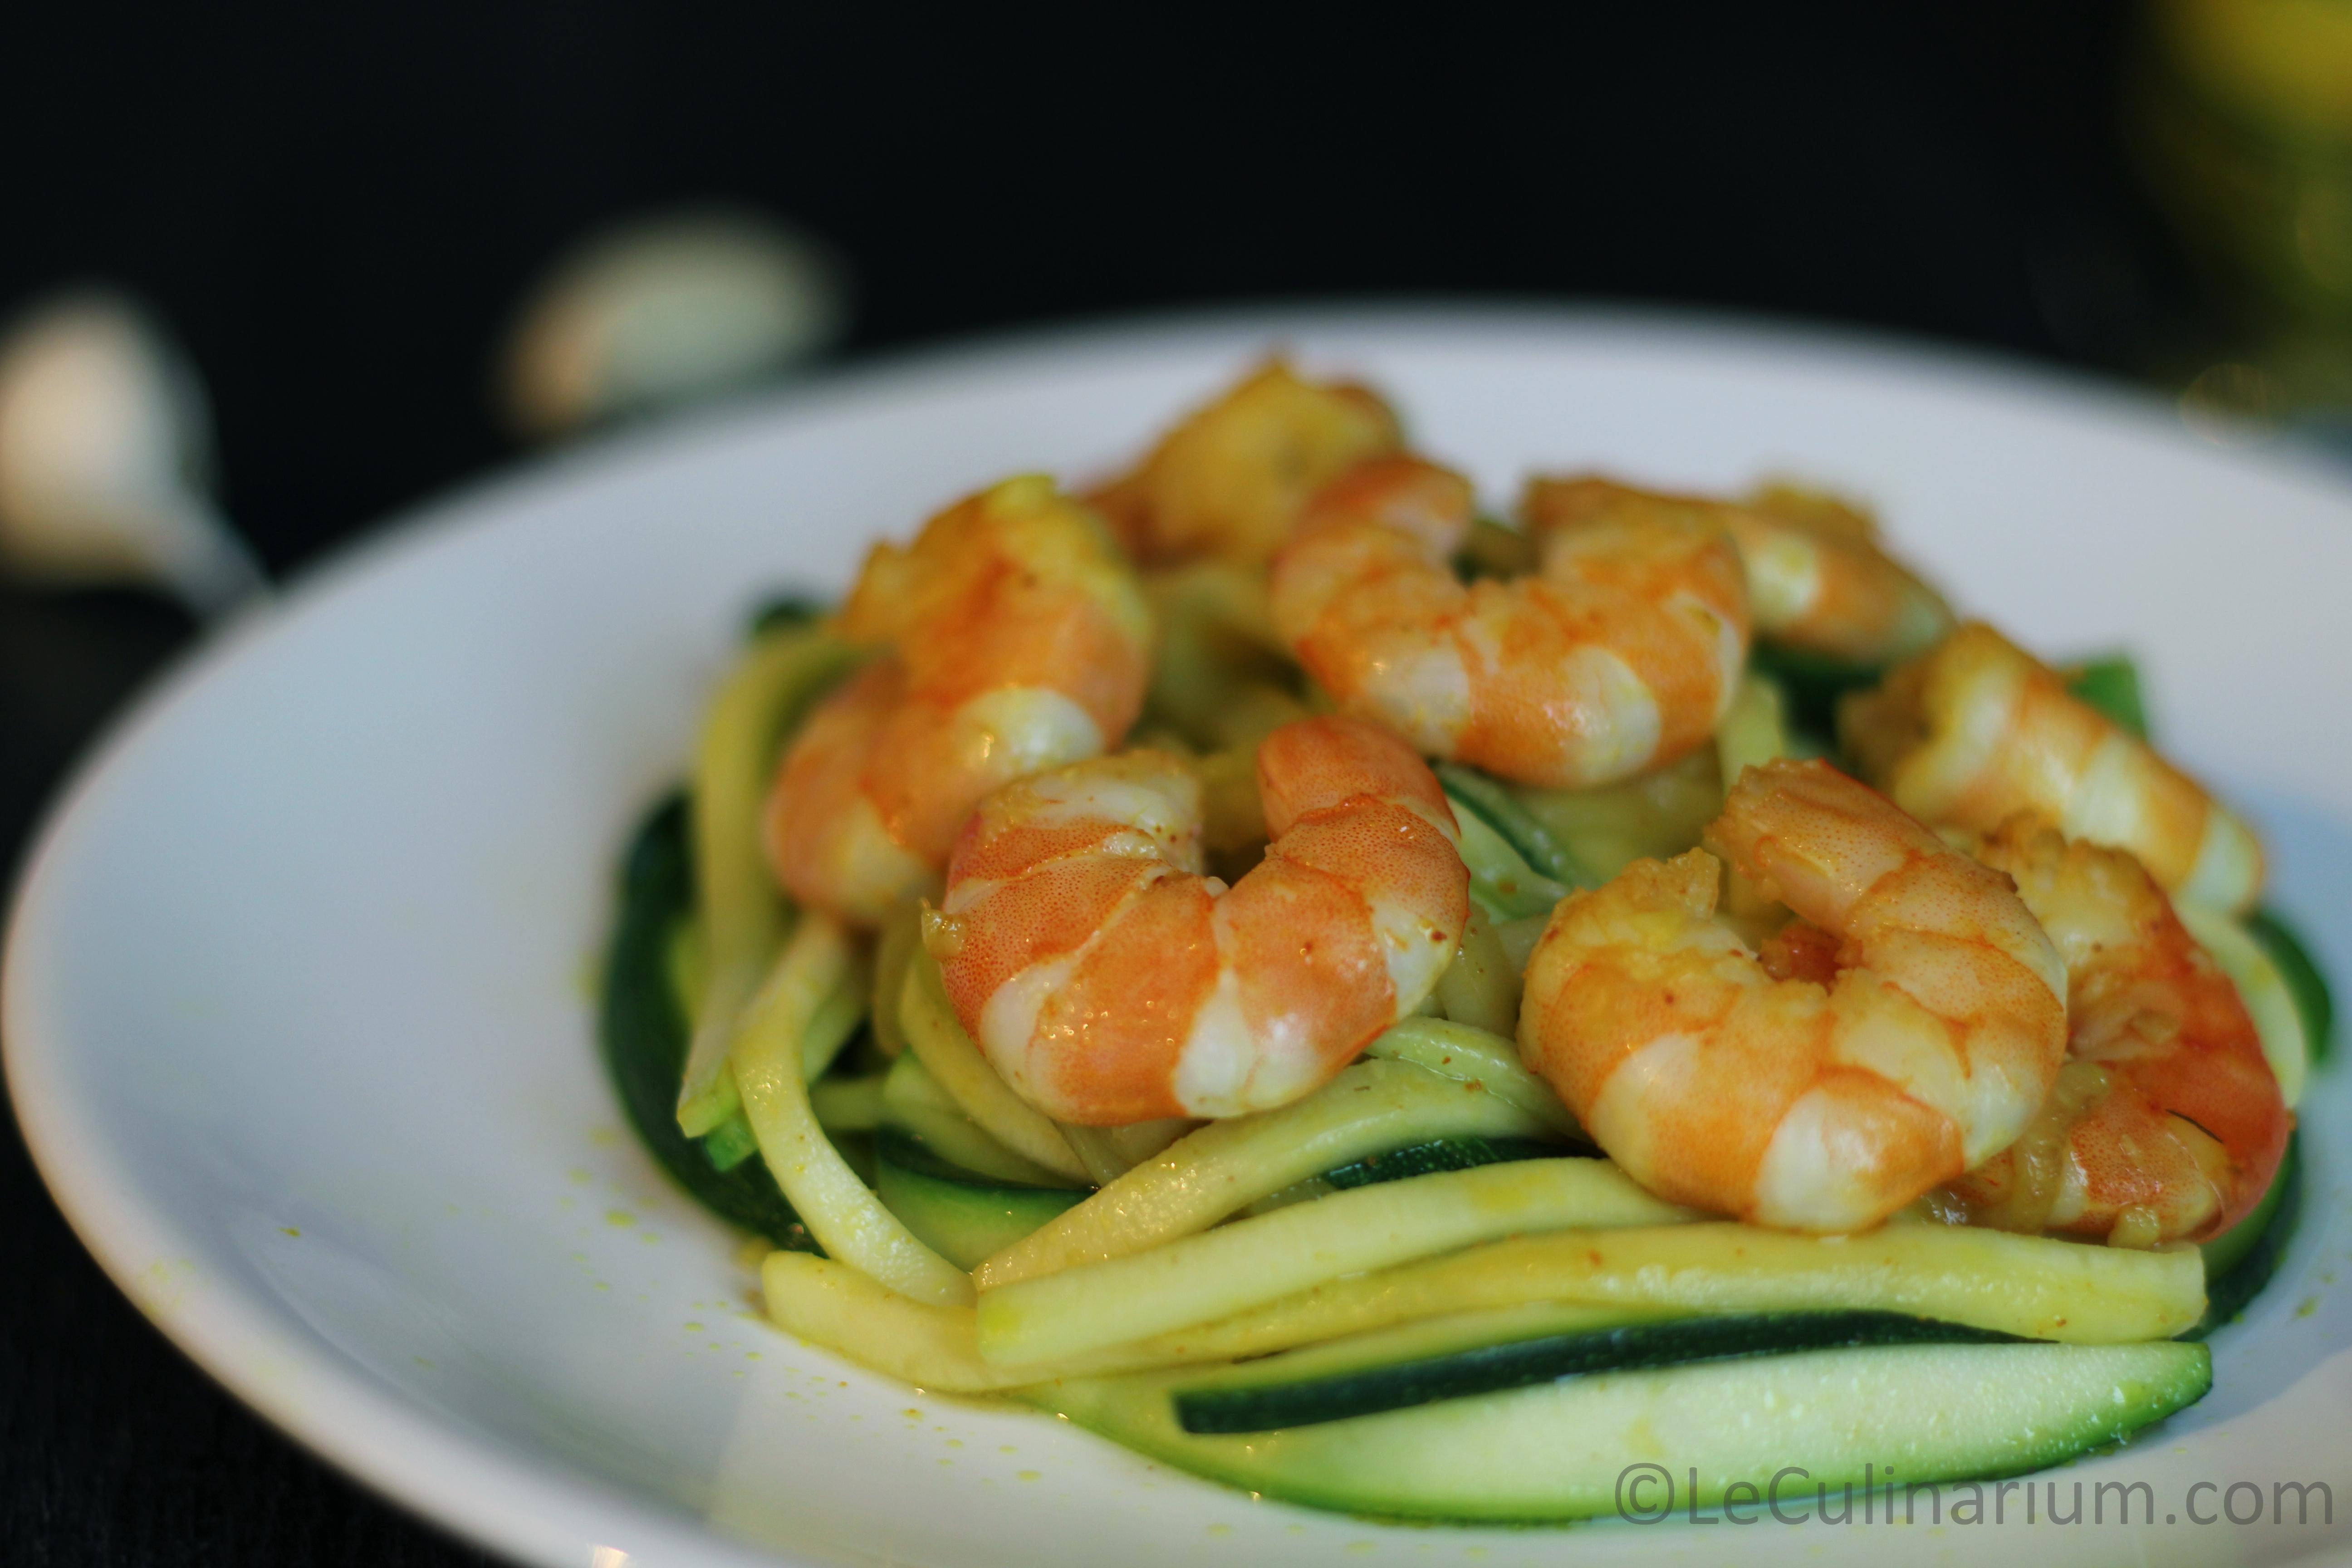 spaghetti courgettes crevettes curcuma copyright Leculinarium